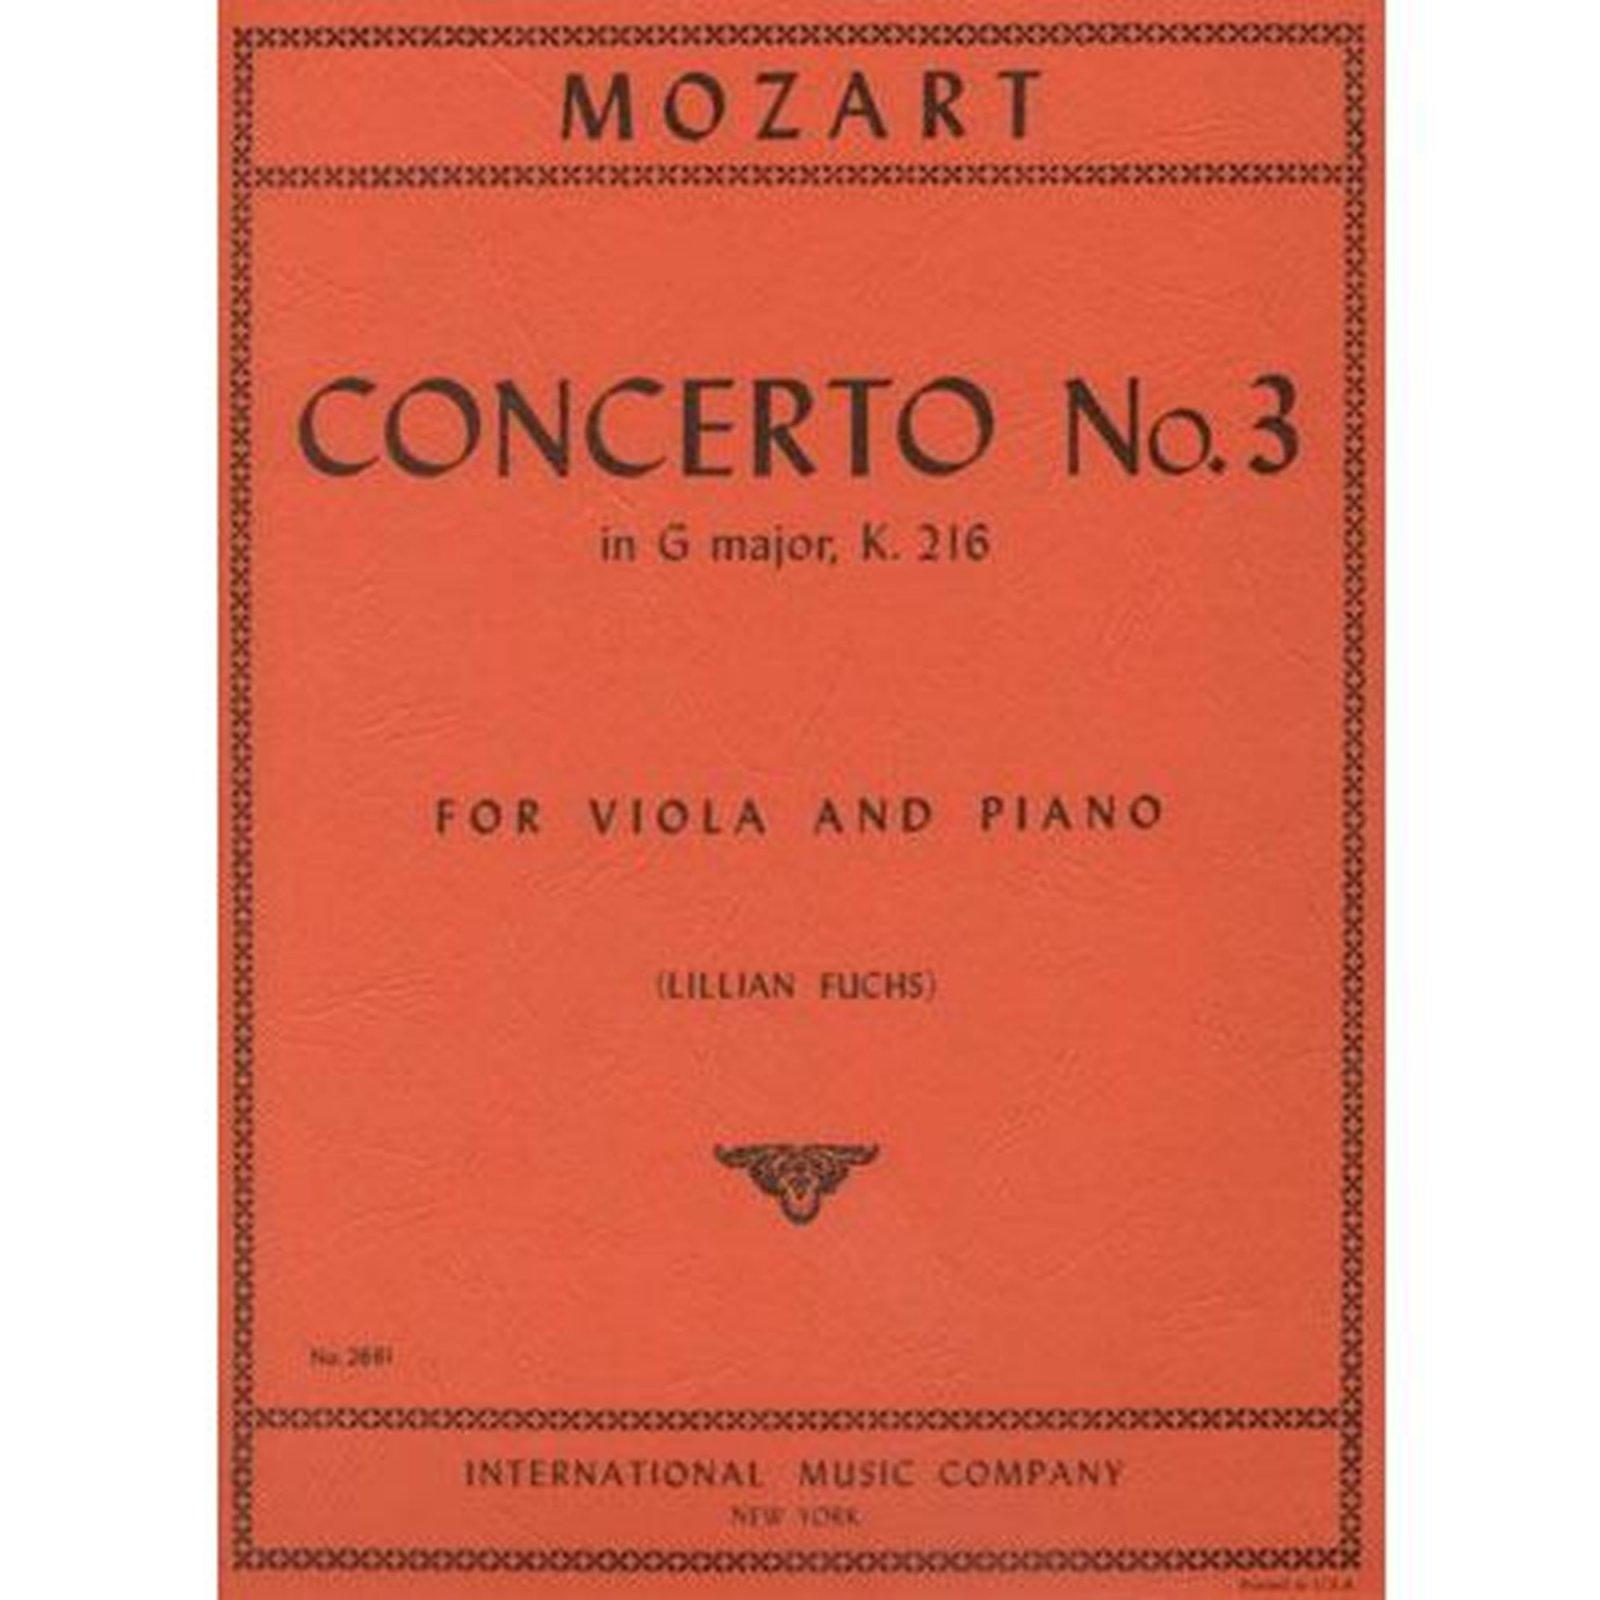 Mozart: Concerto No. 3 In G major K.216 Ed. Francescatti